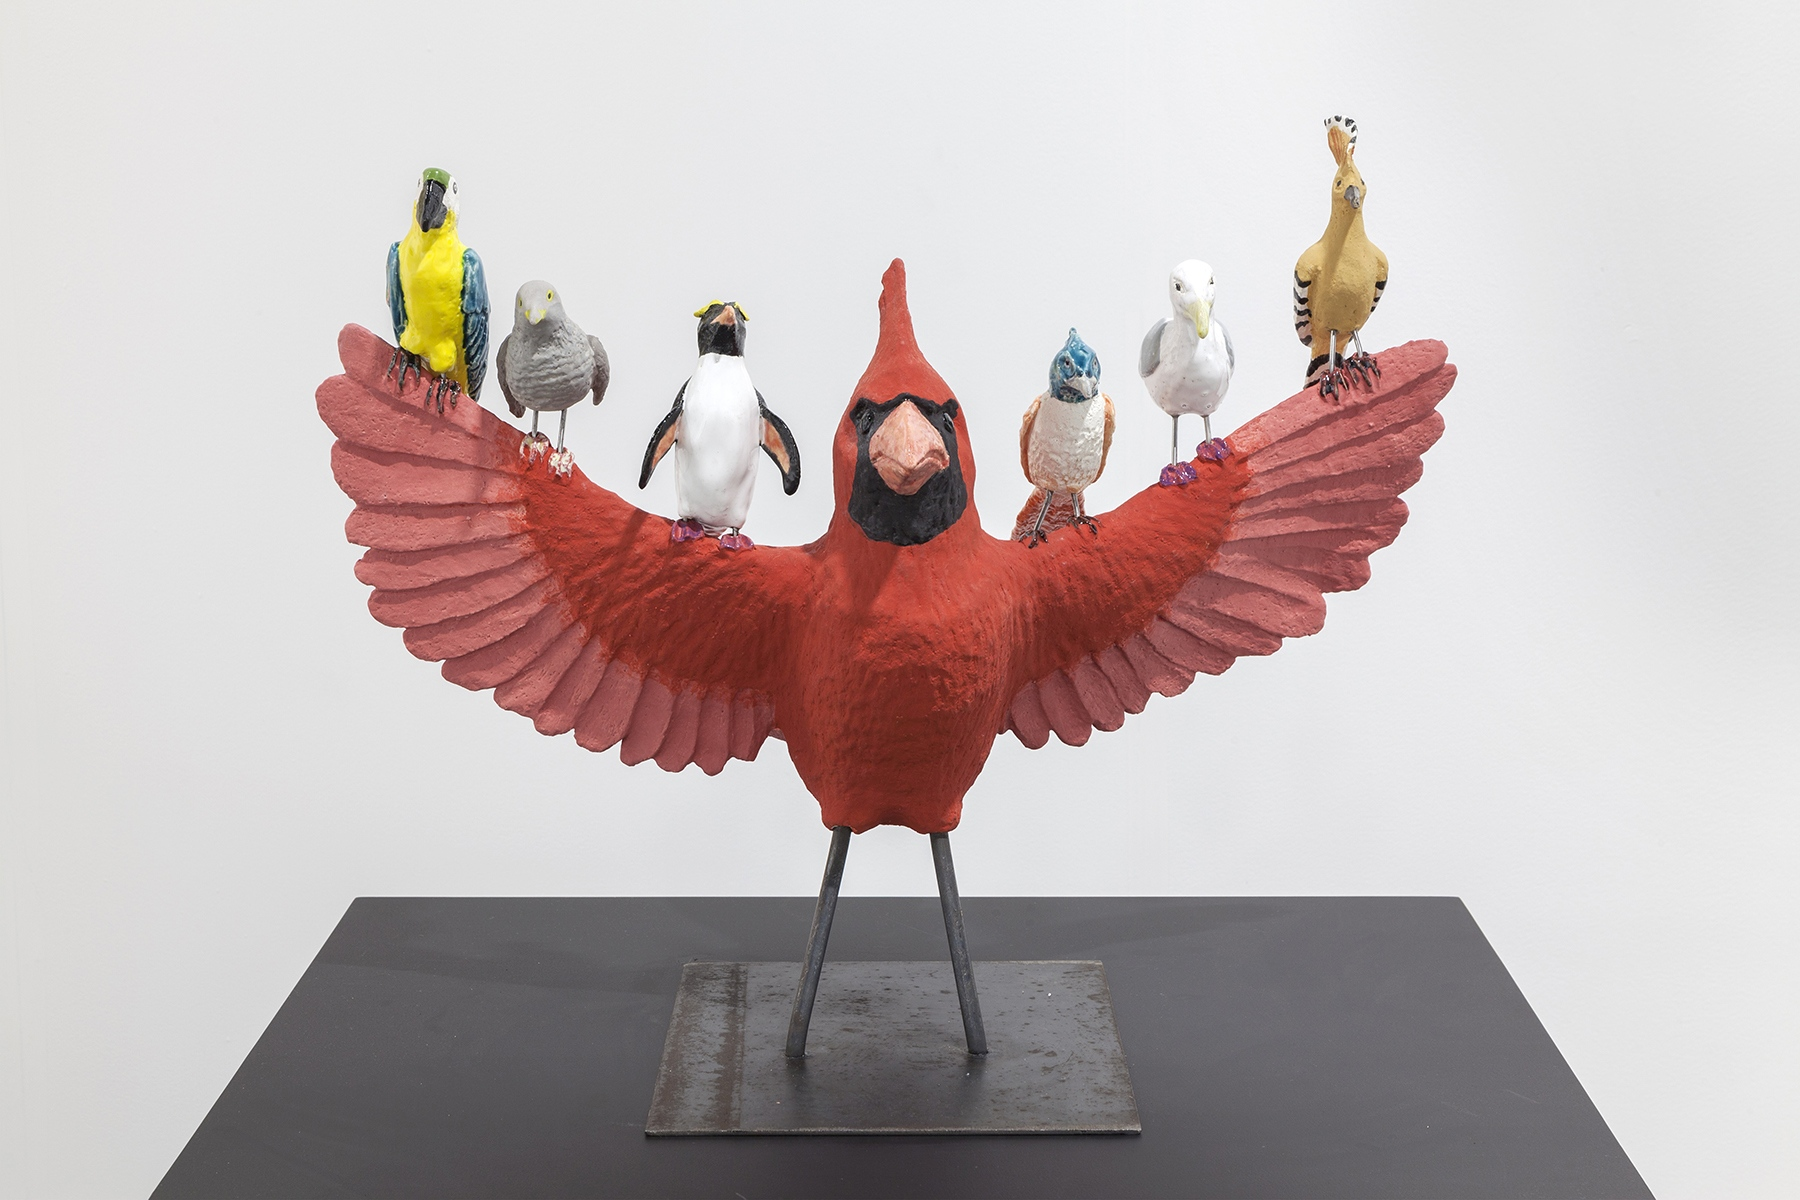 Cardinal, 2017, Ceramic, steel, 50 x 62 x 40 cm